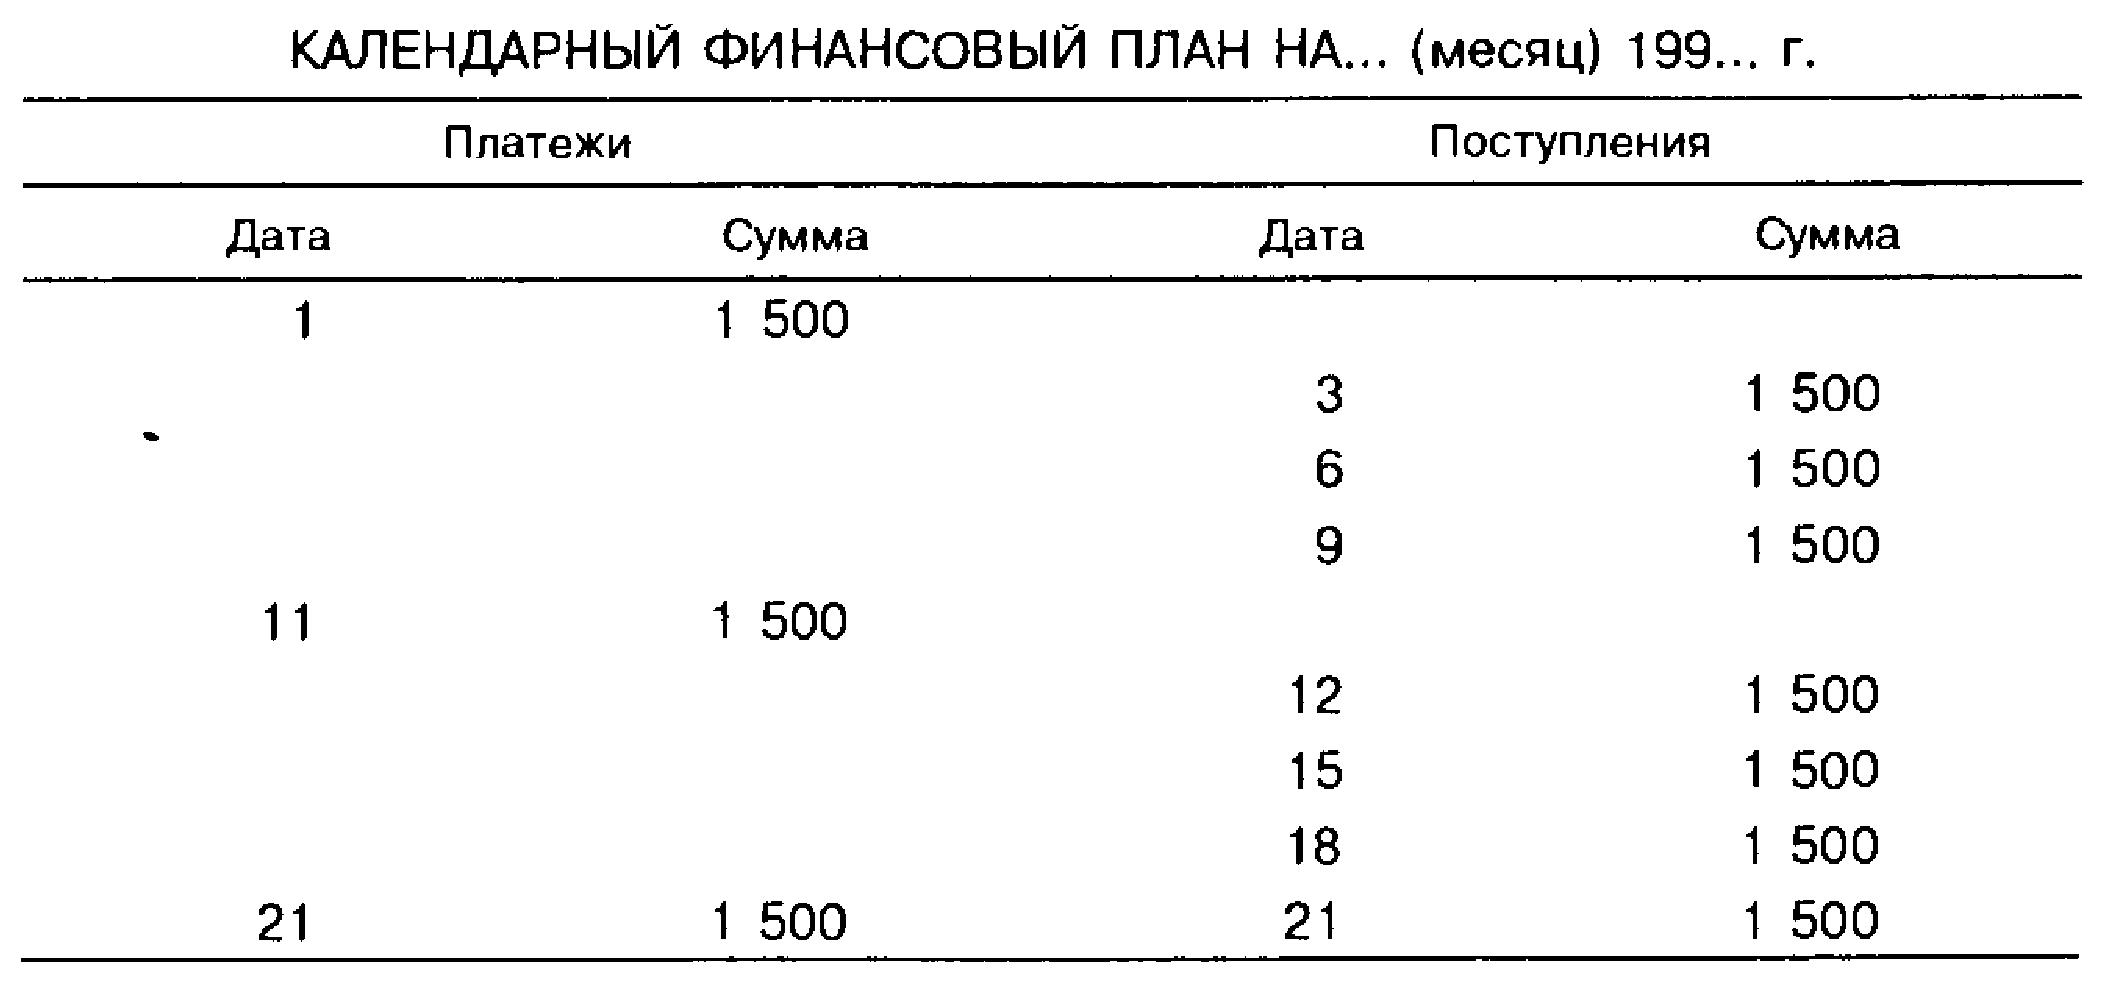 Календарный финансовый план на... (месяц) 199... г.